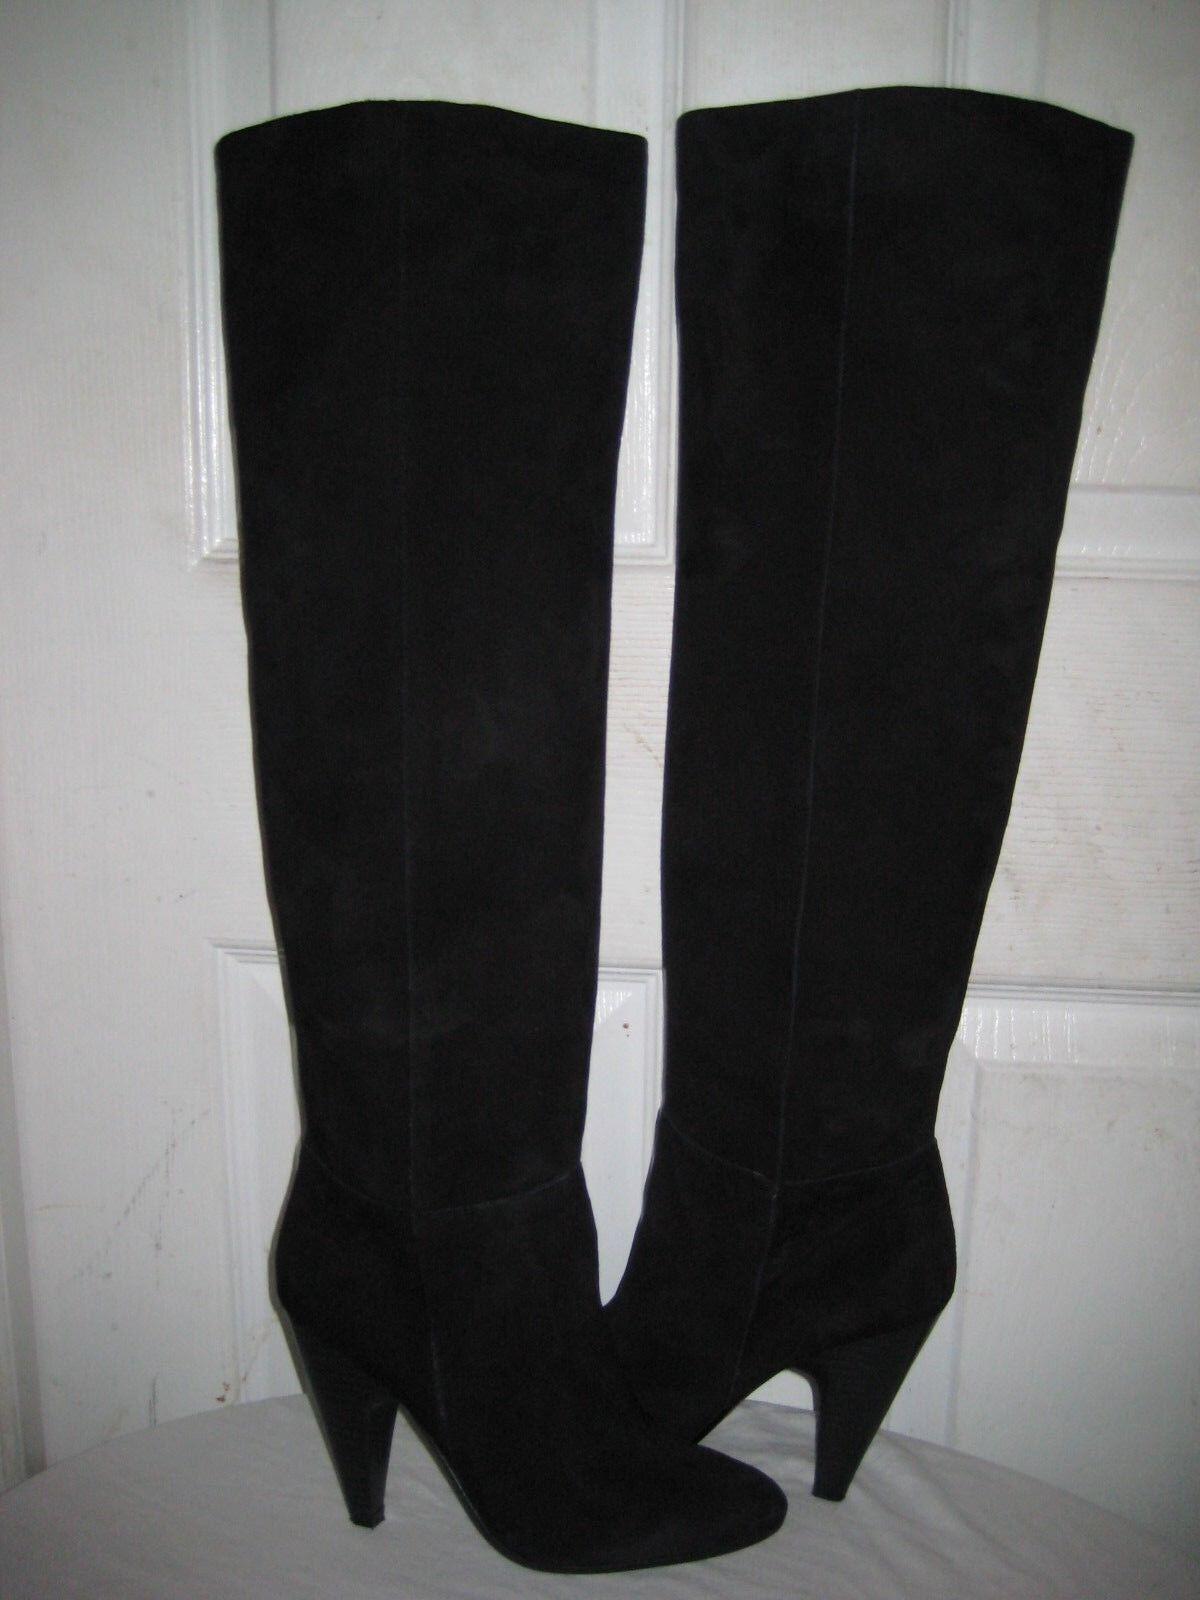 ASH  INTENSE Black Suede Knee High Boots Boots Boots shoes Women's Size 37   6.5 c7a5d1